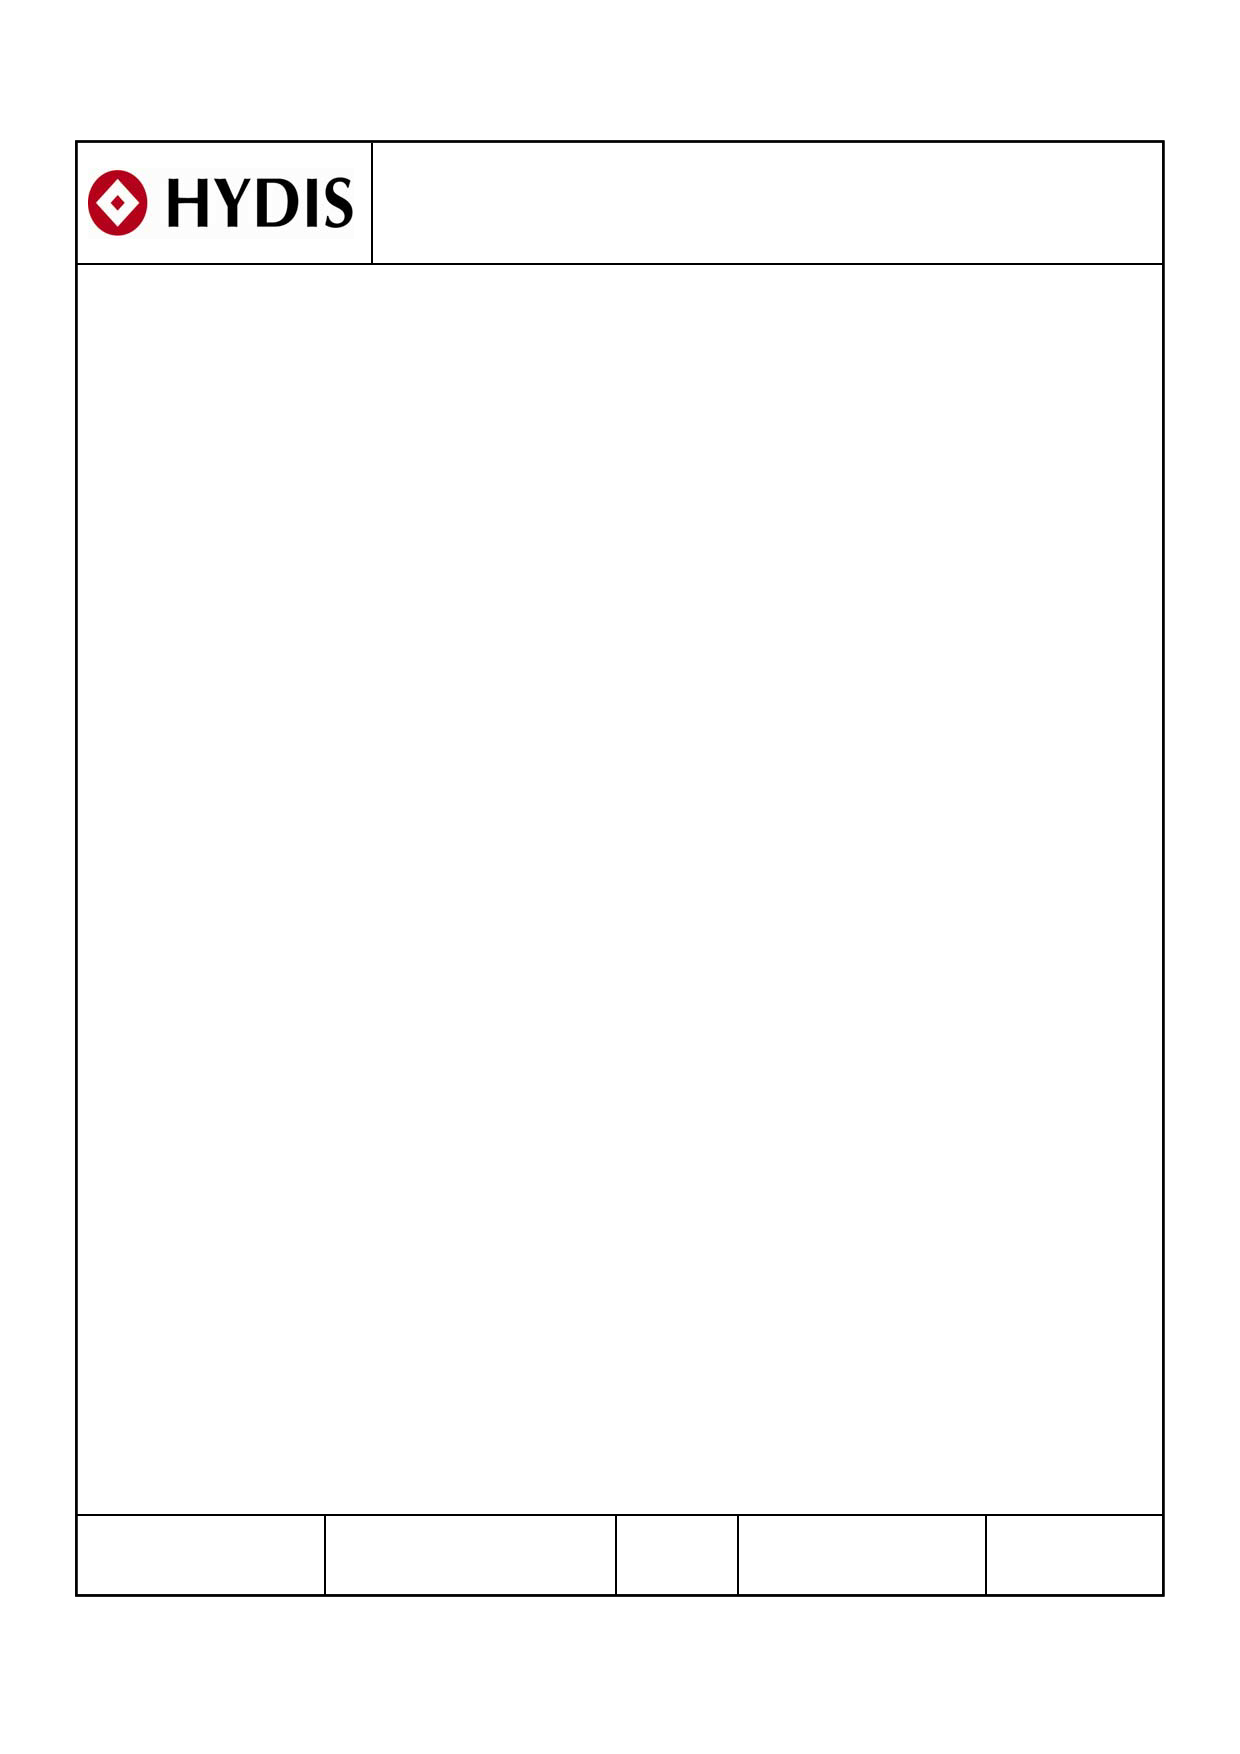 HV089WX1-100 Datasheet, HV089WX1-100 PDF,ピン配置, 機能